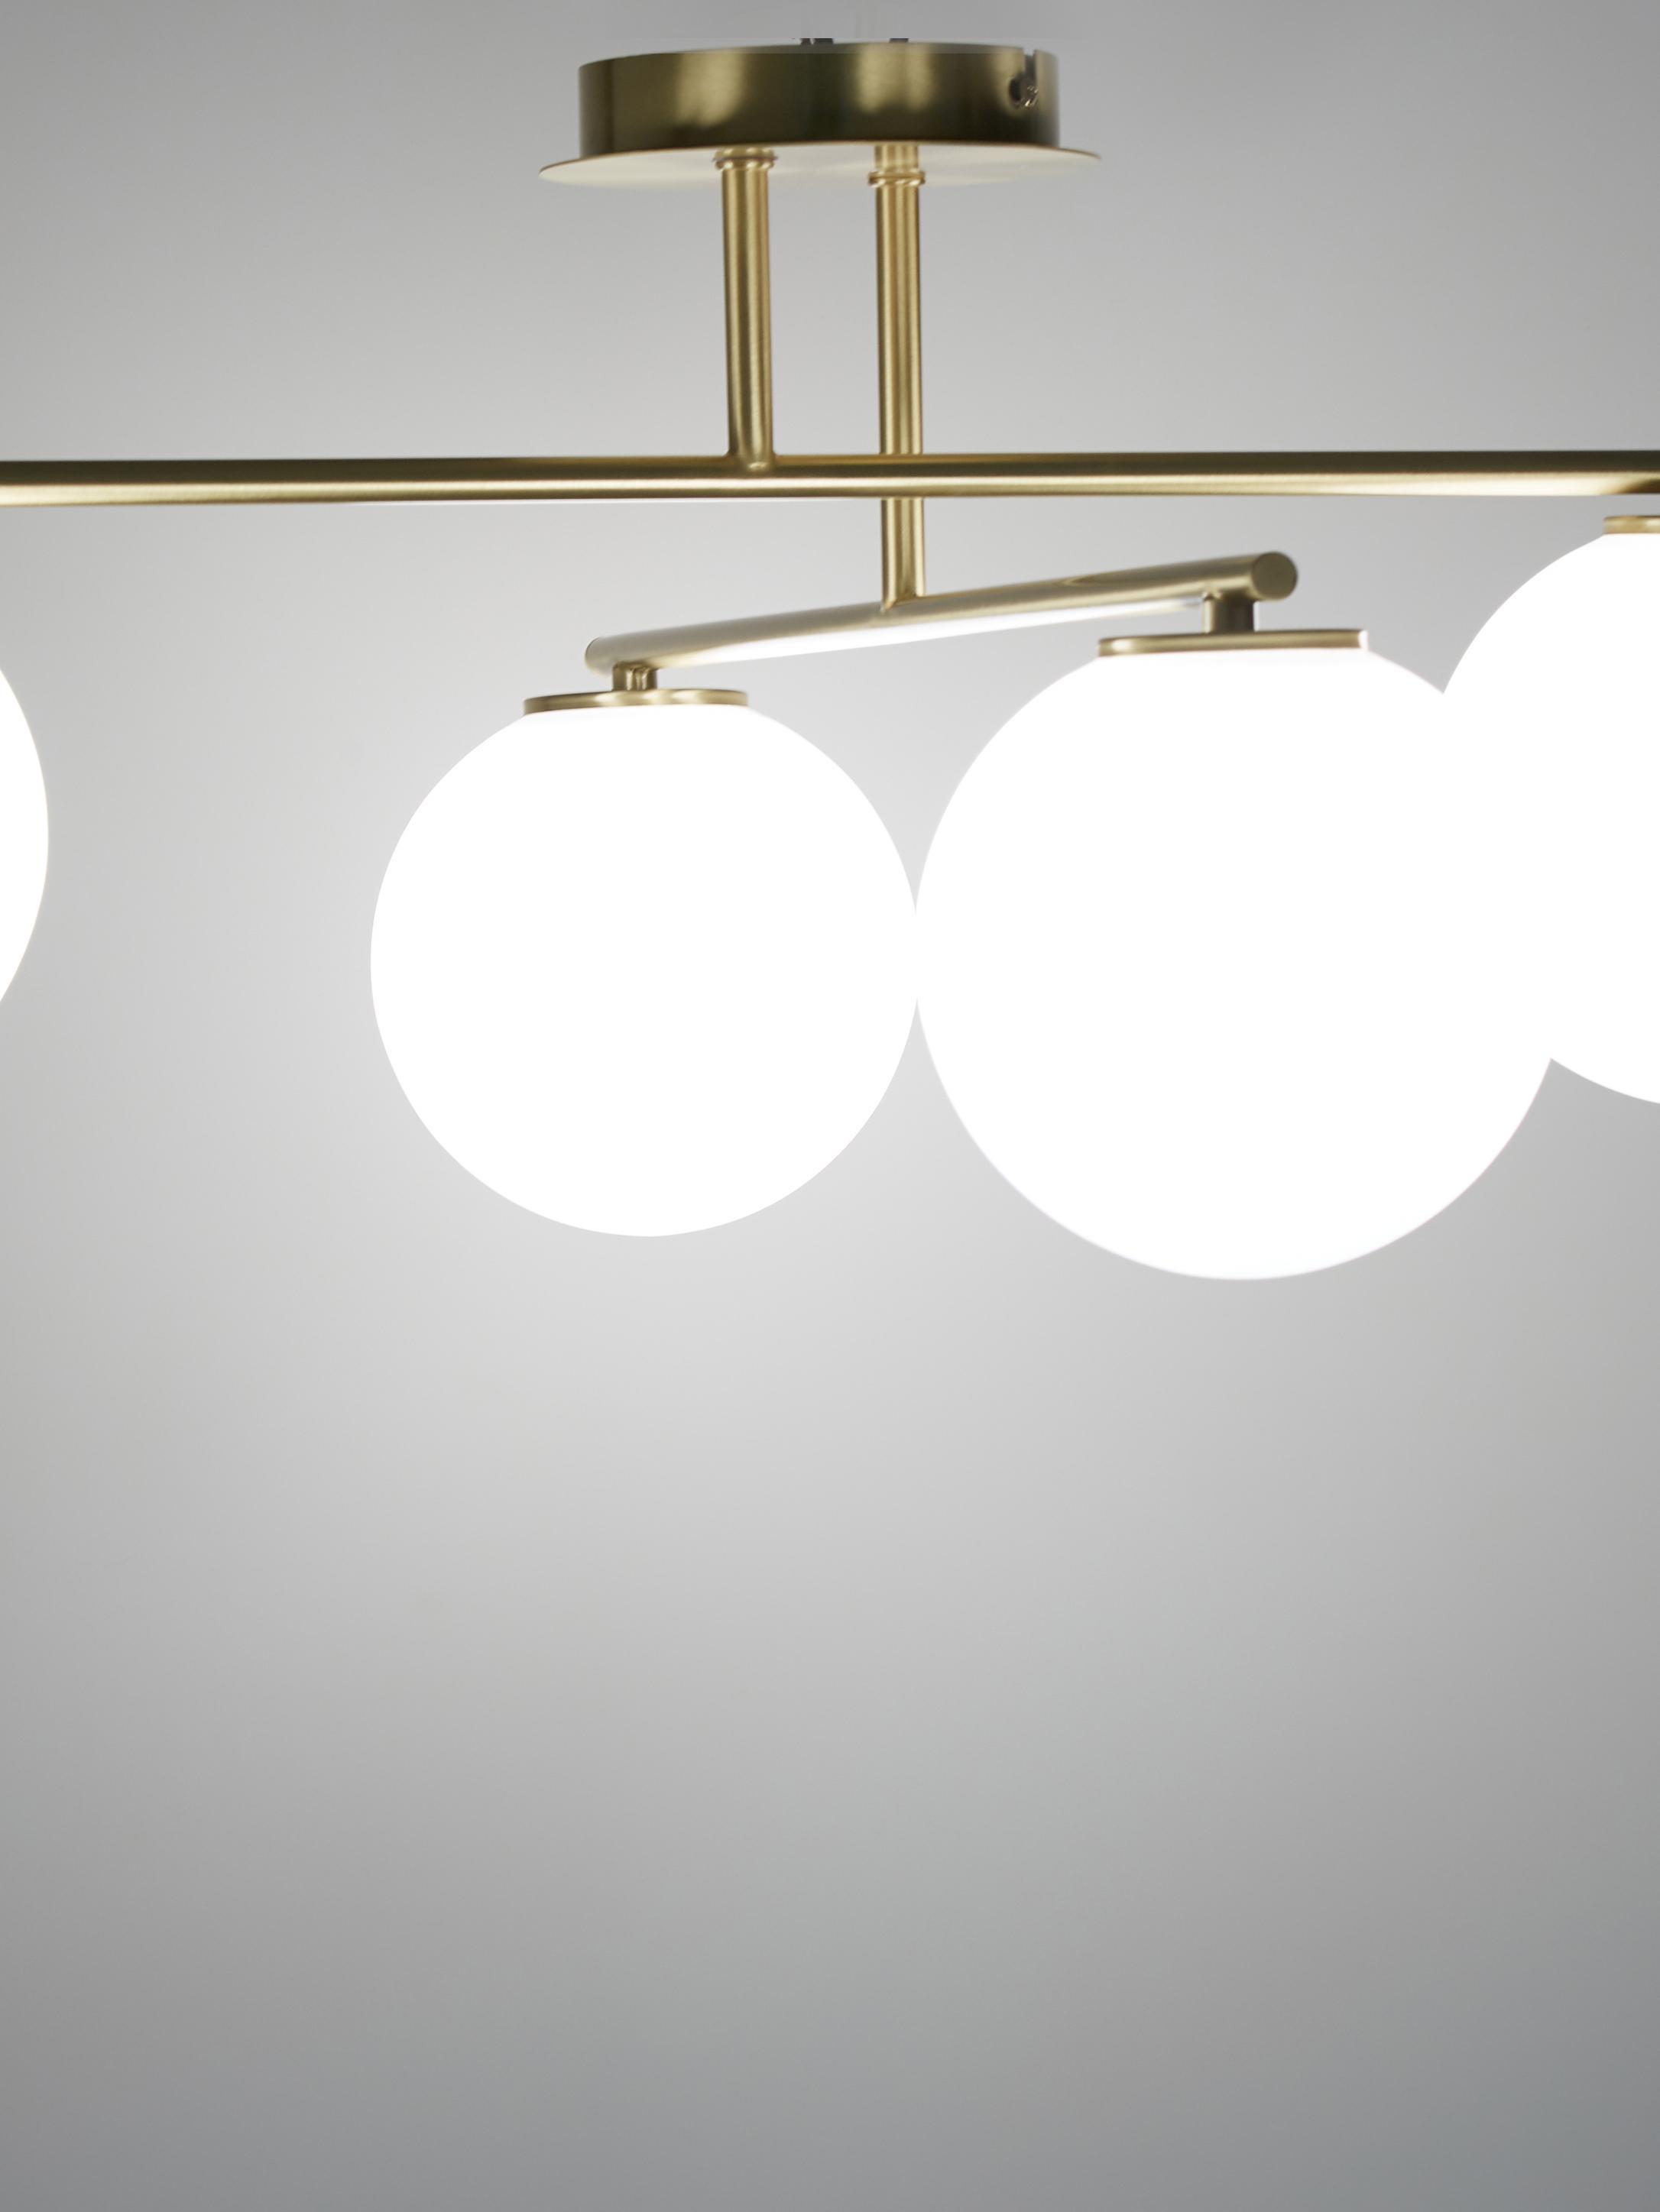 Deckenleuchte Atlanta in Gold, Baldachin: Metall, vermessingt, Weiß, Messing, 65 x 30 cm